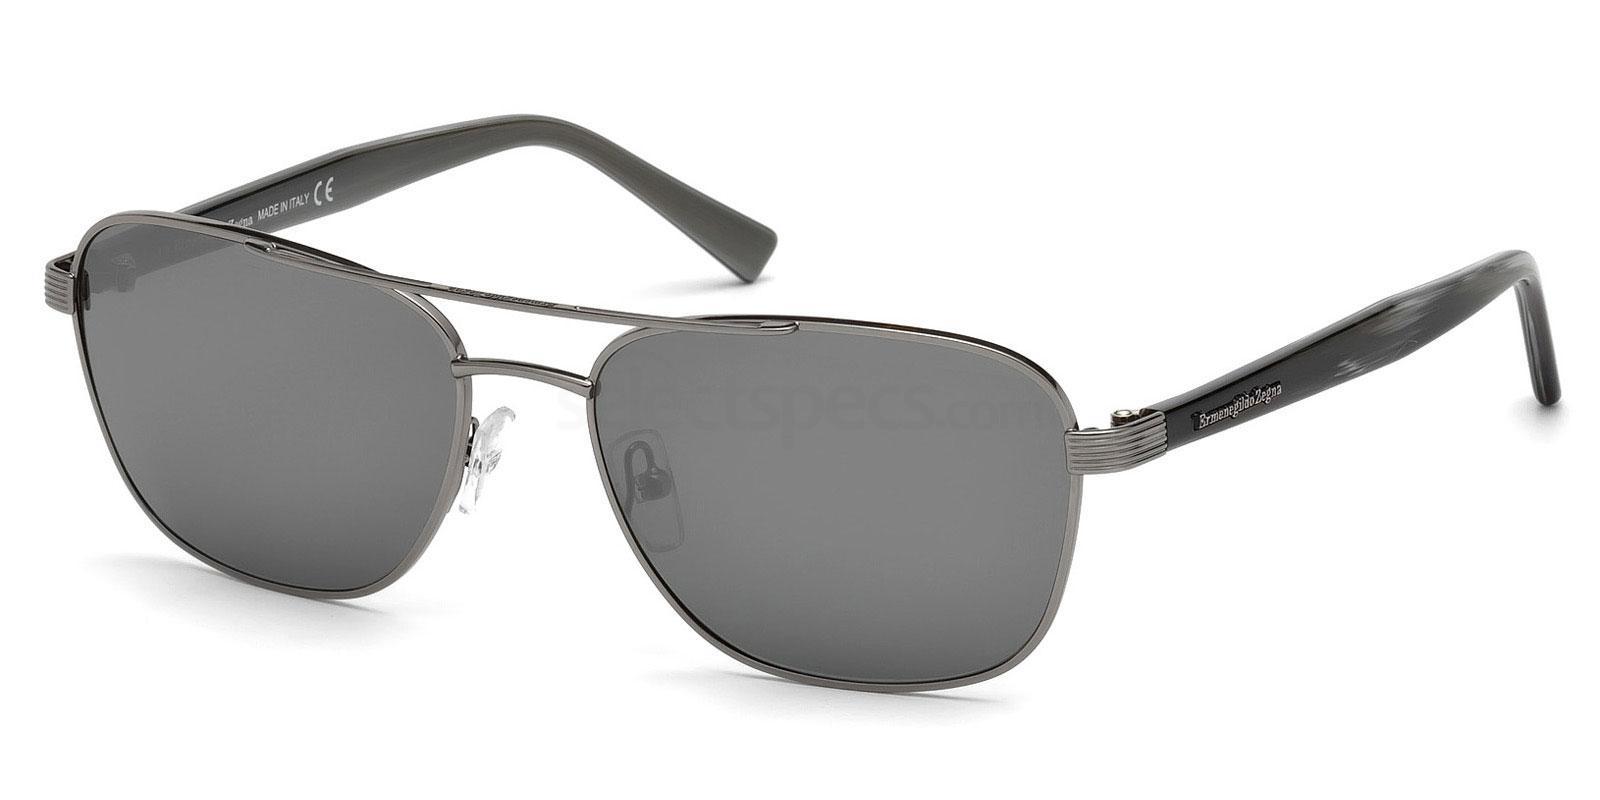 08C EZ0068 Sunglasses, Ermenegildo Zegna